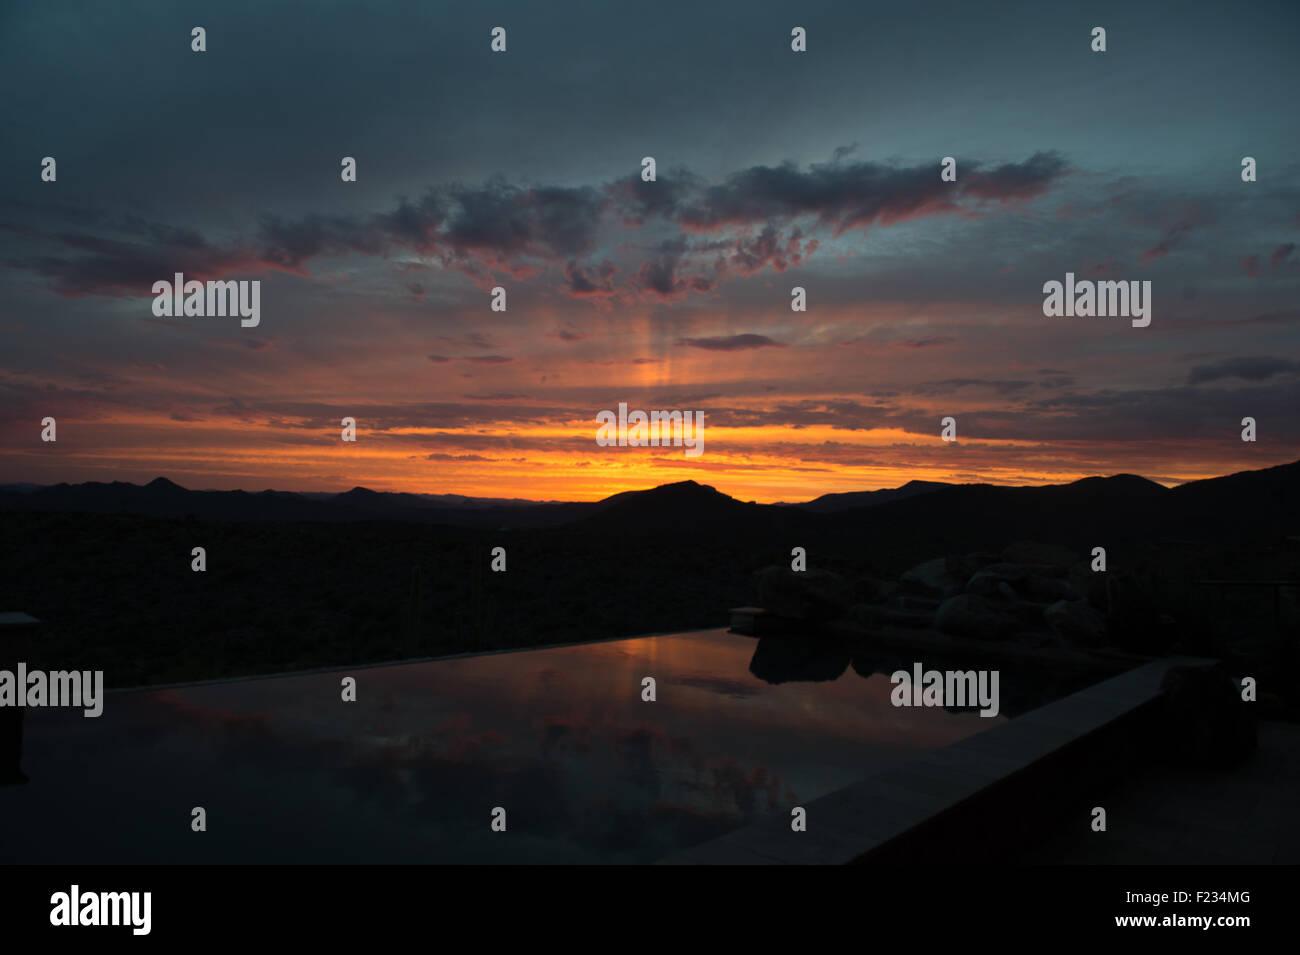 Starburst Sunset - Stock Image